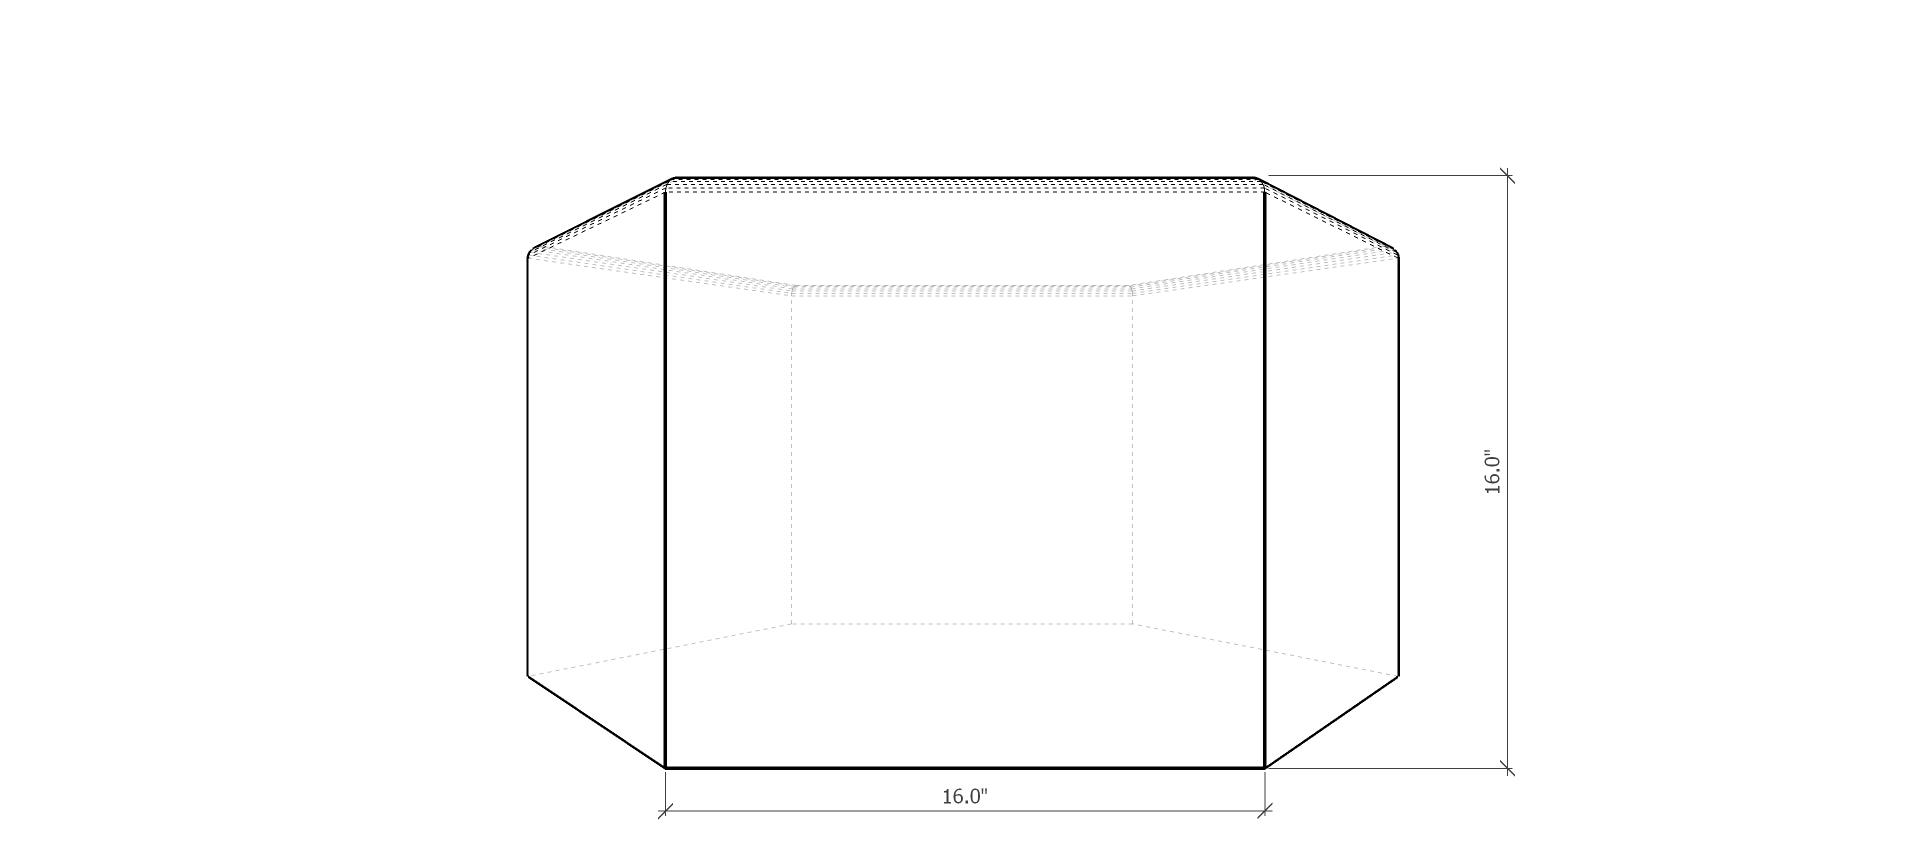 7 - saturnian - short hex front.jpg